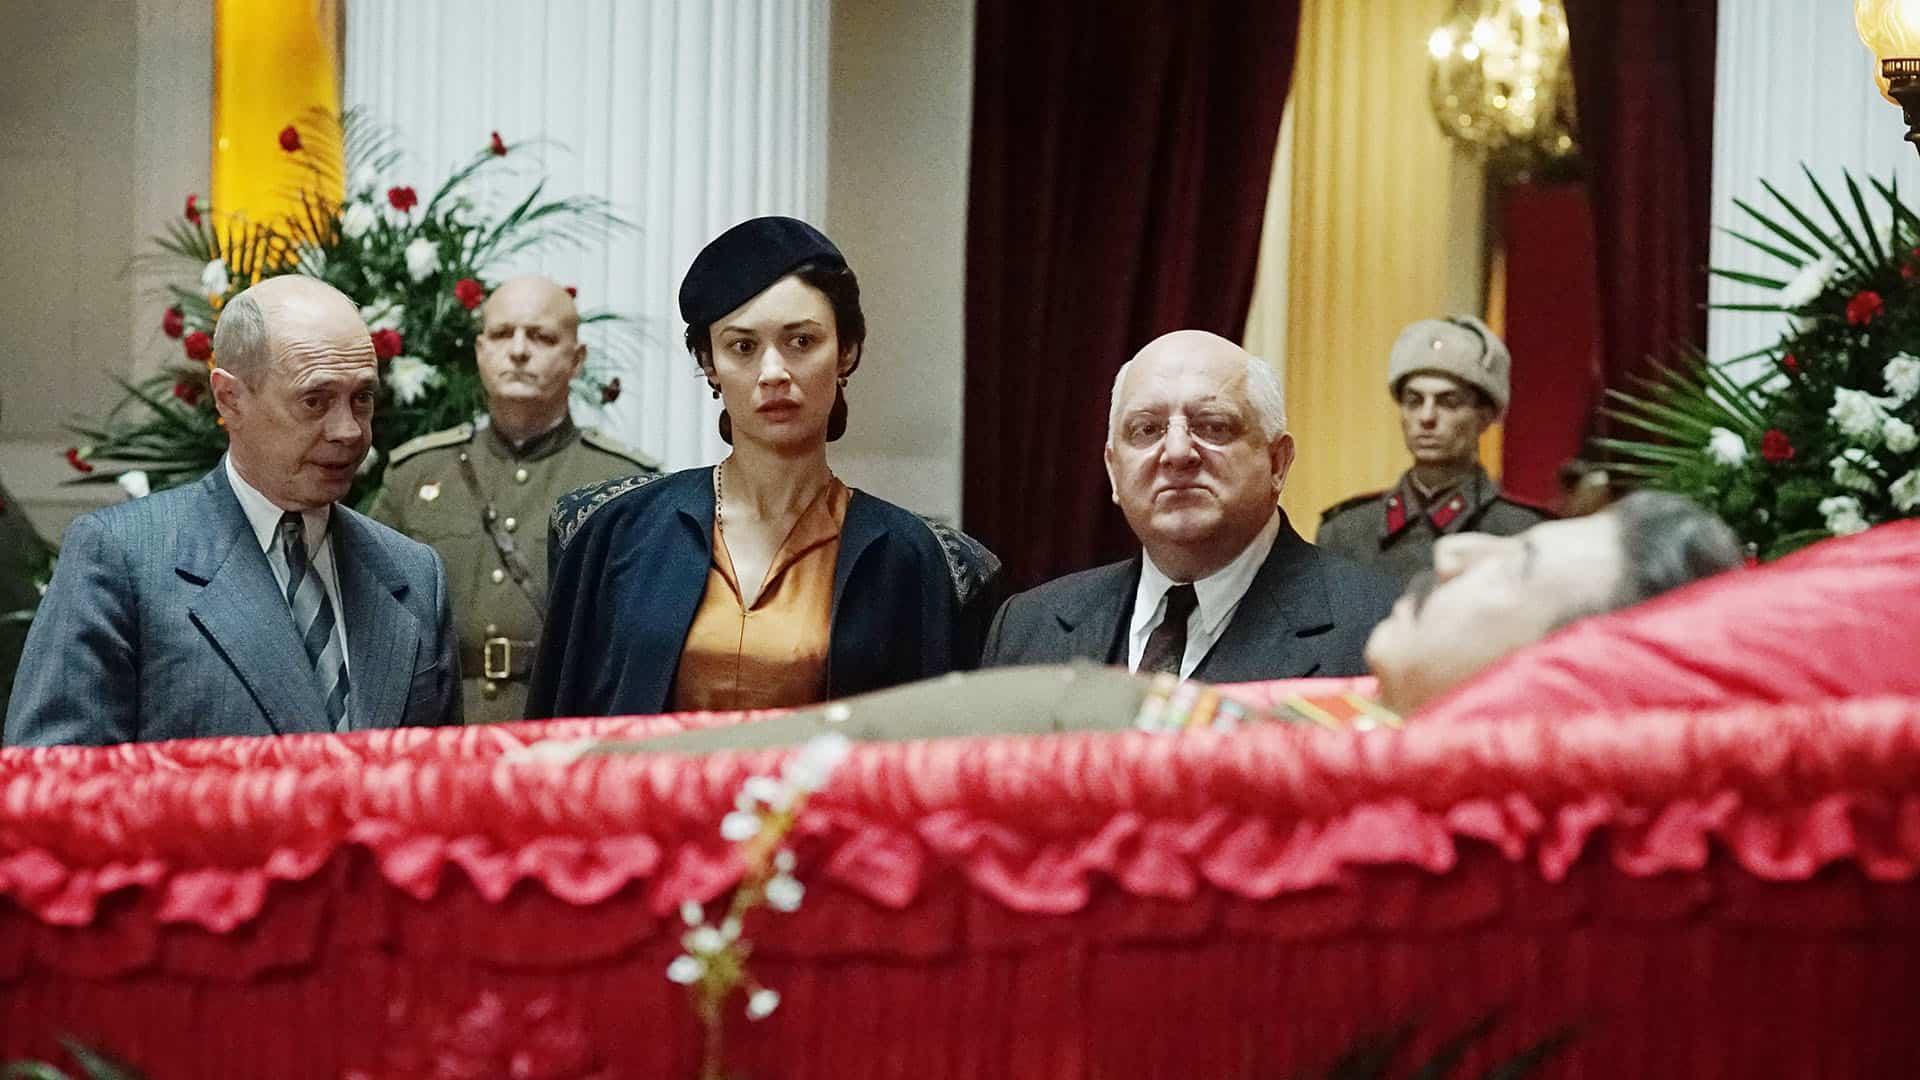 stalin movie review The death of stalin, 2017 directed by armando iannucci starring steve buscemi, jeffrey tambor, simon russell beale, andrea riseborough, adrian mcloughlin, jason .